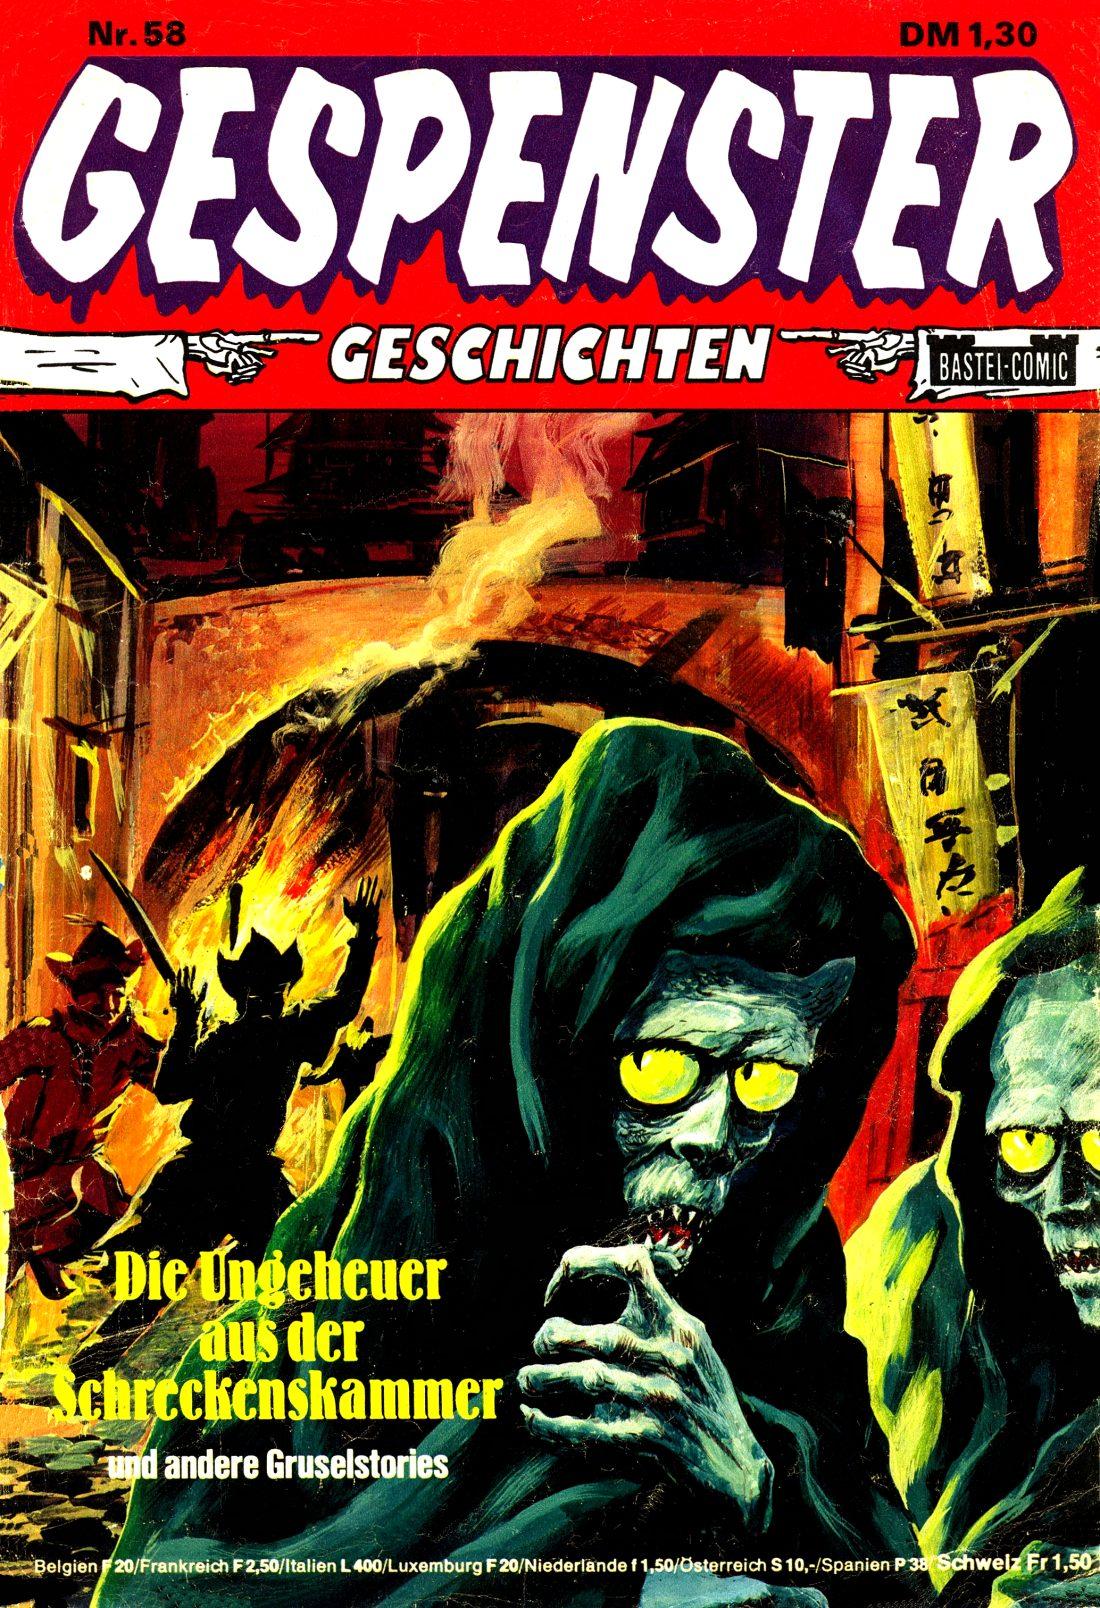 Gespenster Geschichten - 58